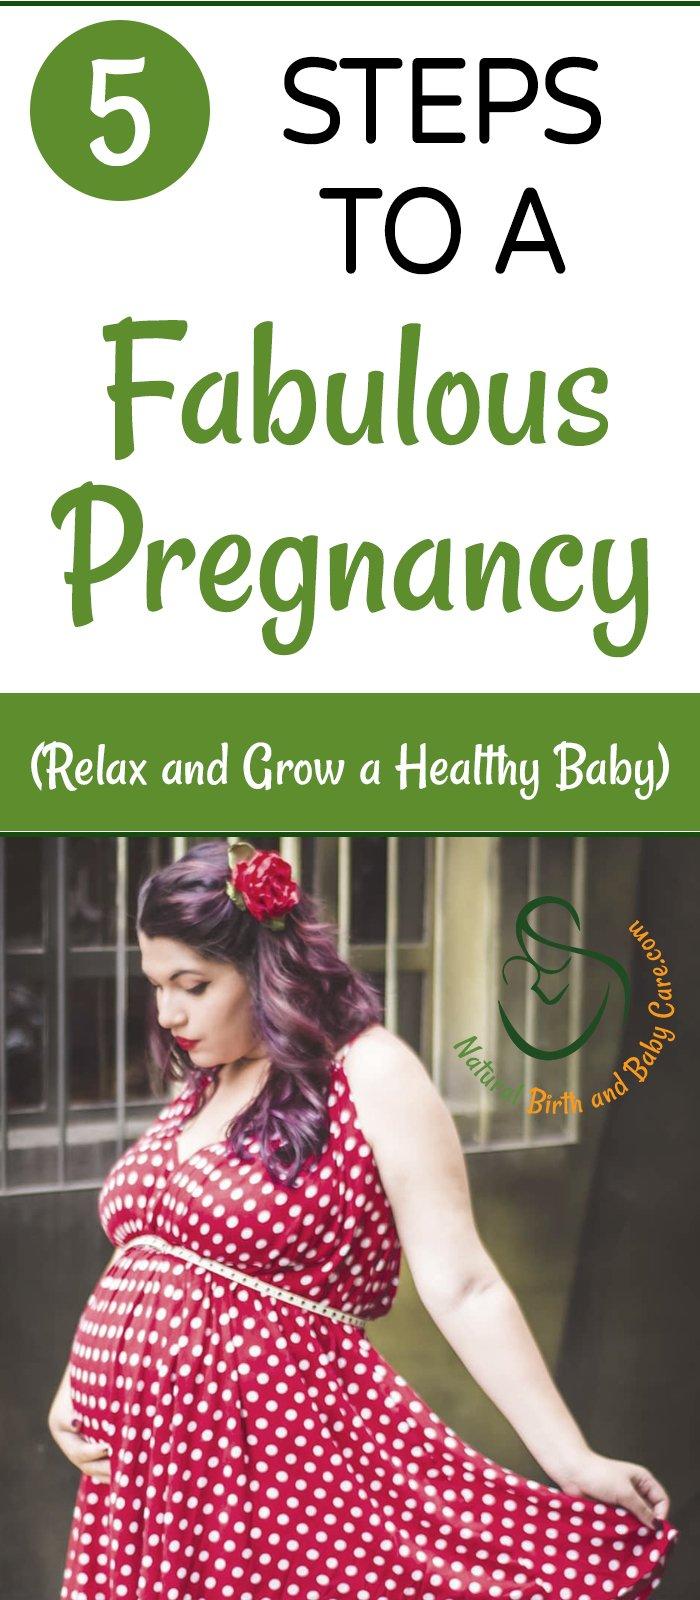 Have a Fabulous Pregnancy